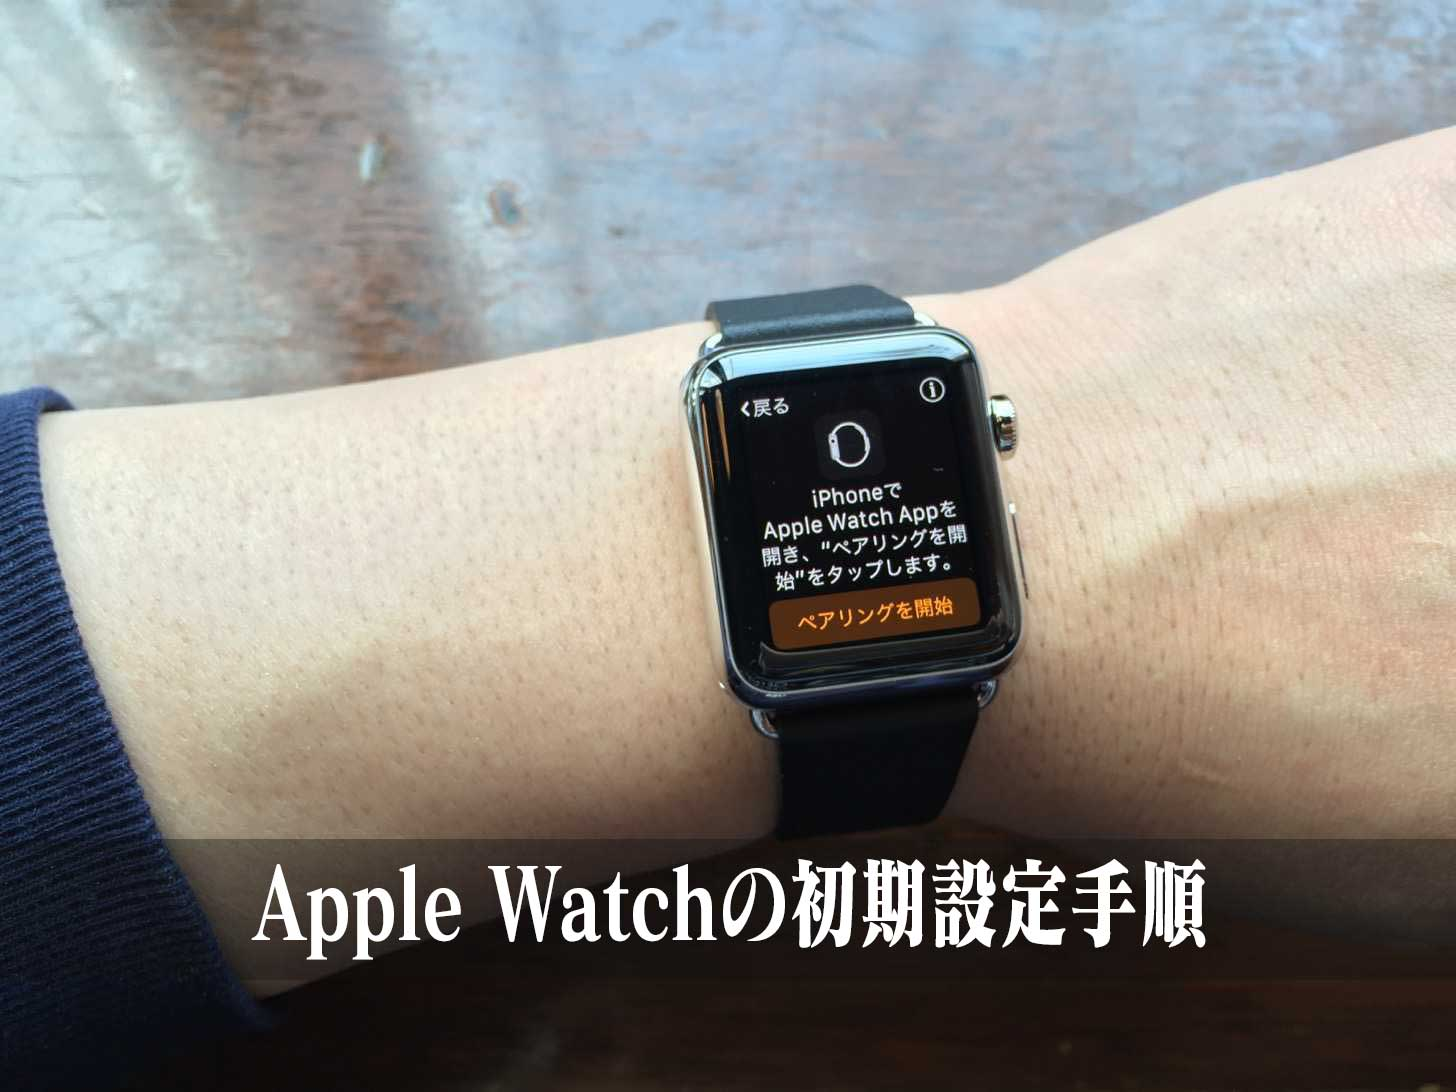 Apple Watchの初期設定手順。